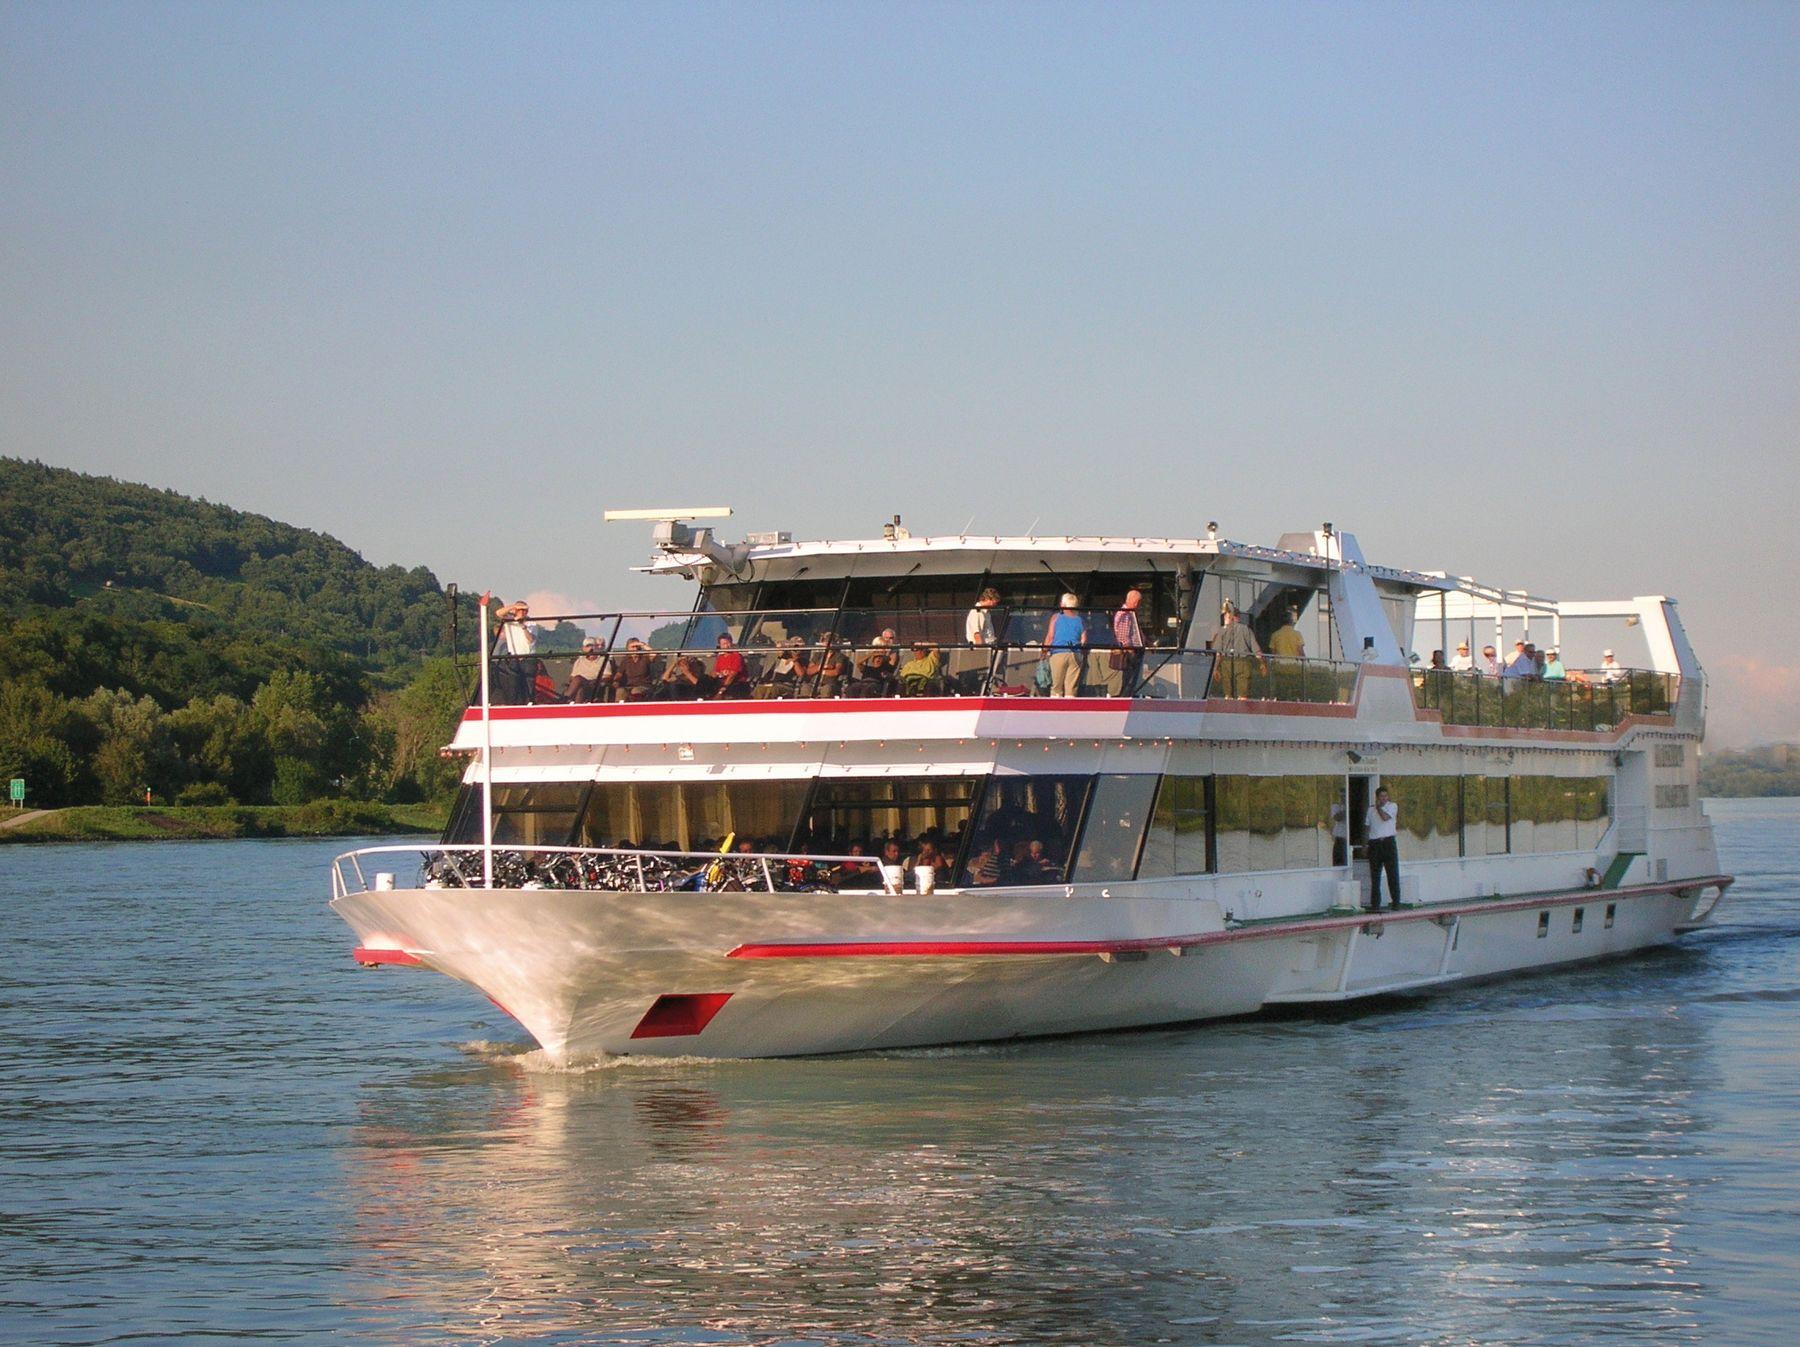 MS Kaiserin Elisabeth Aussenansicht c Donau Touristik